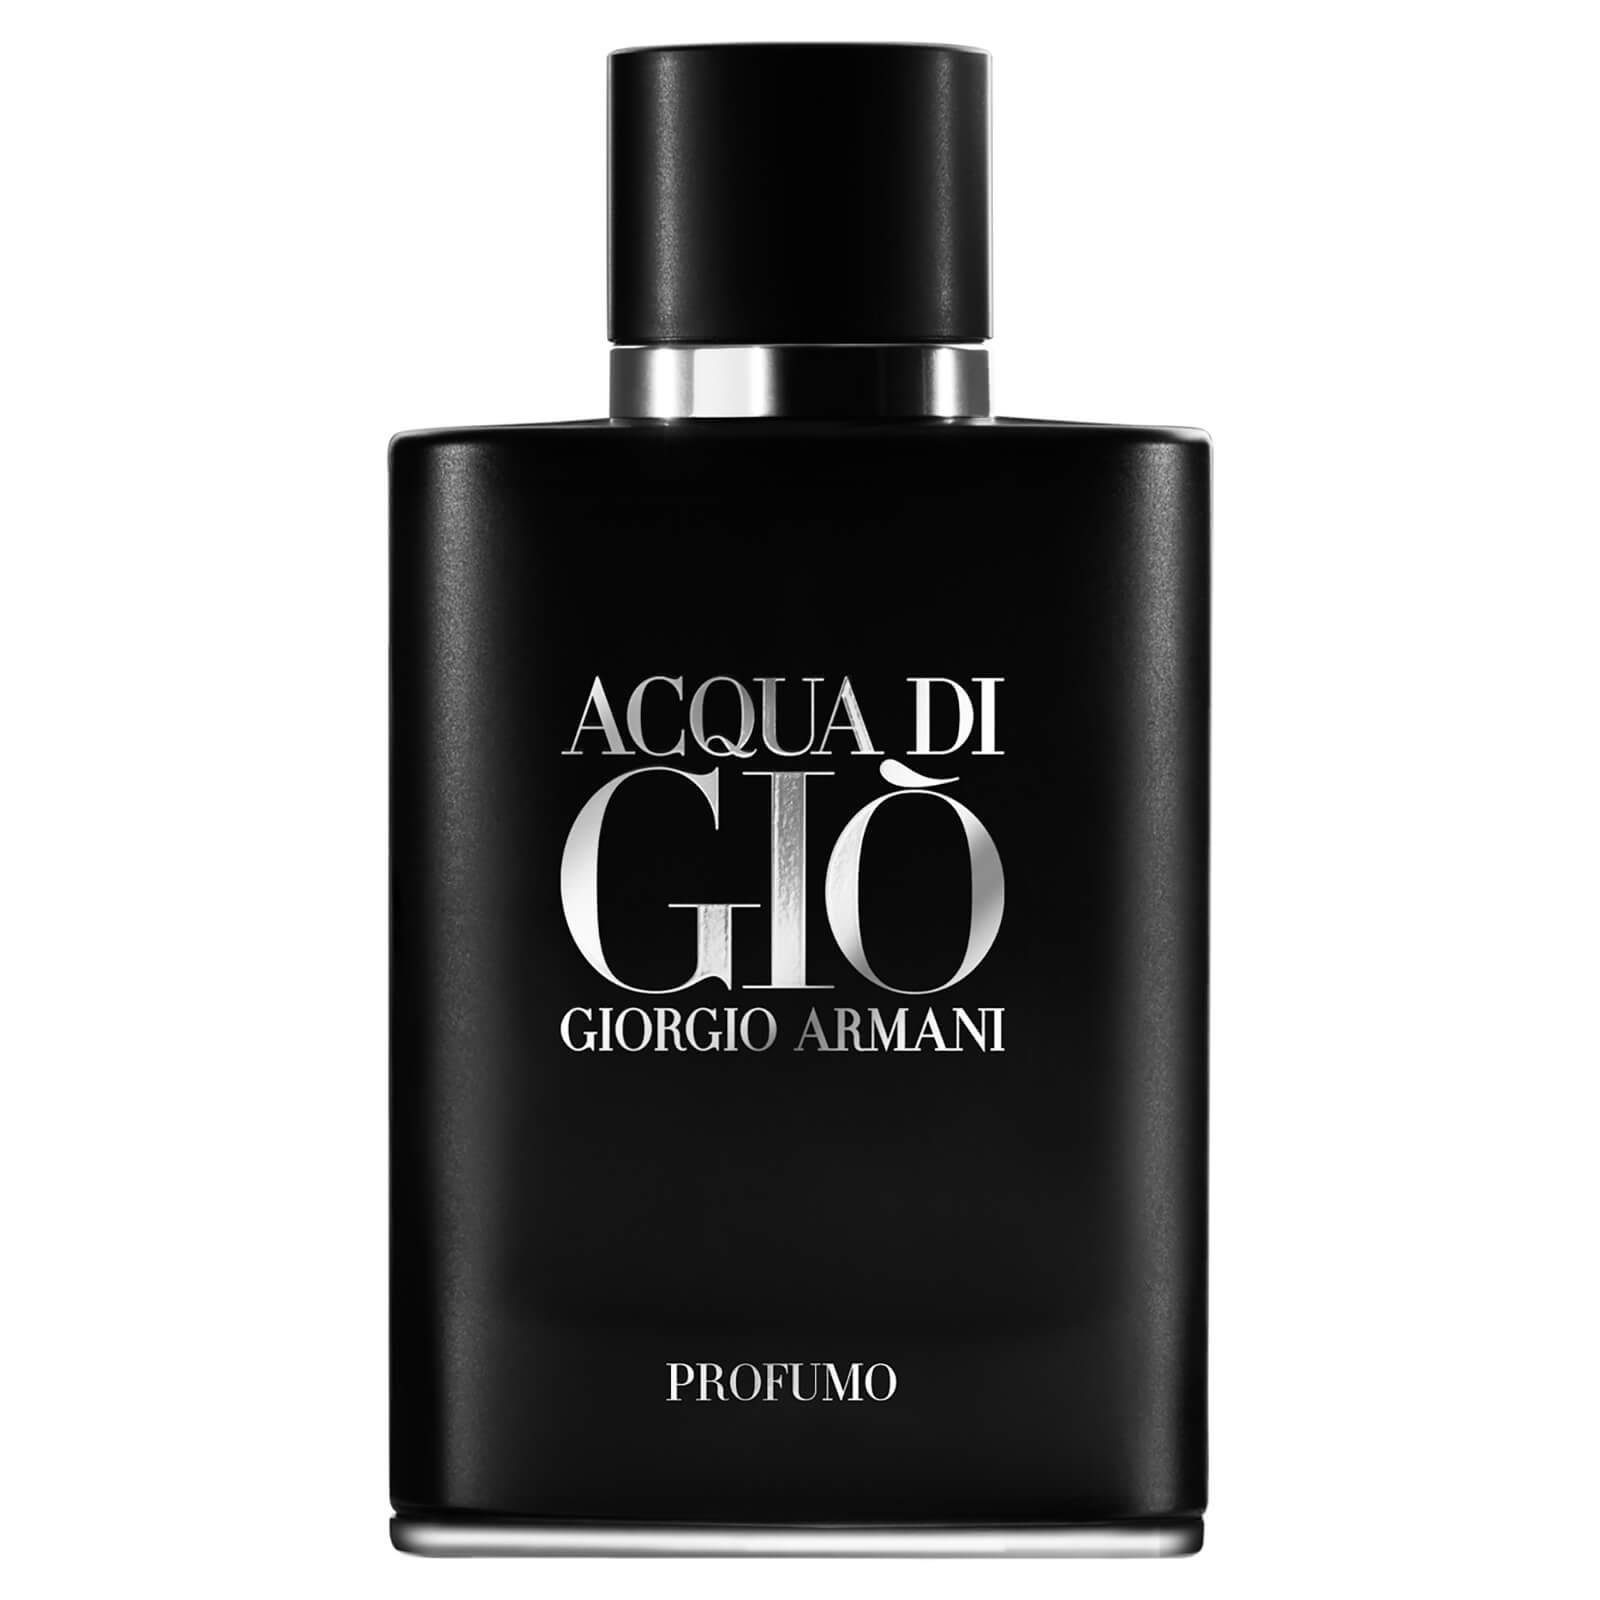 Armani Acqua Di Gio Homme Profumo Eau de Parfum (Various Sizes) - 75ml